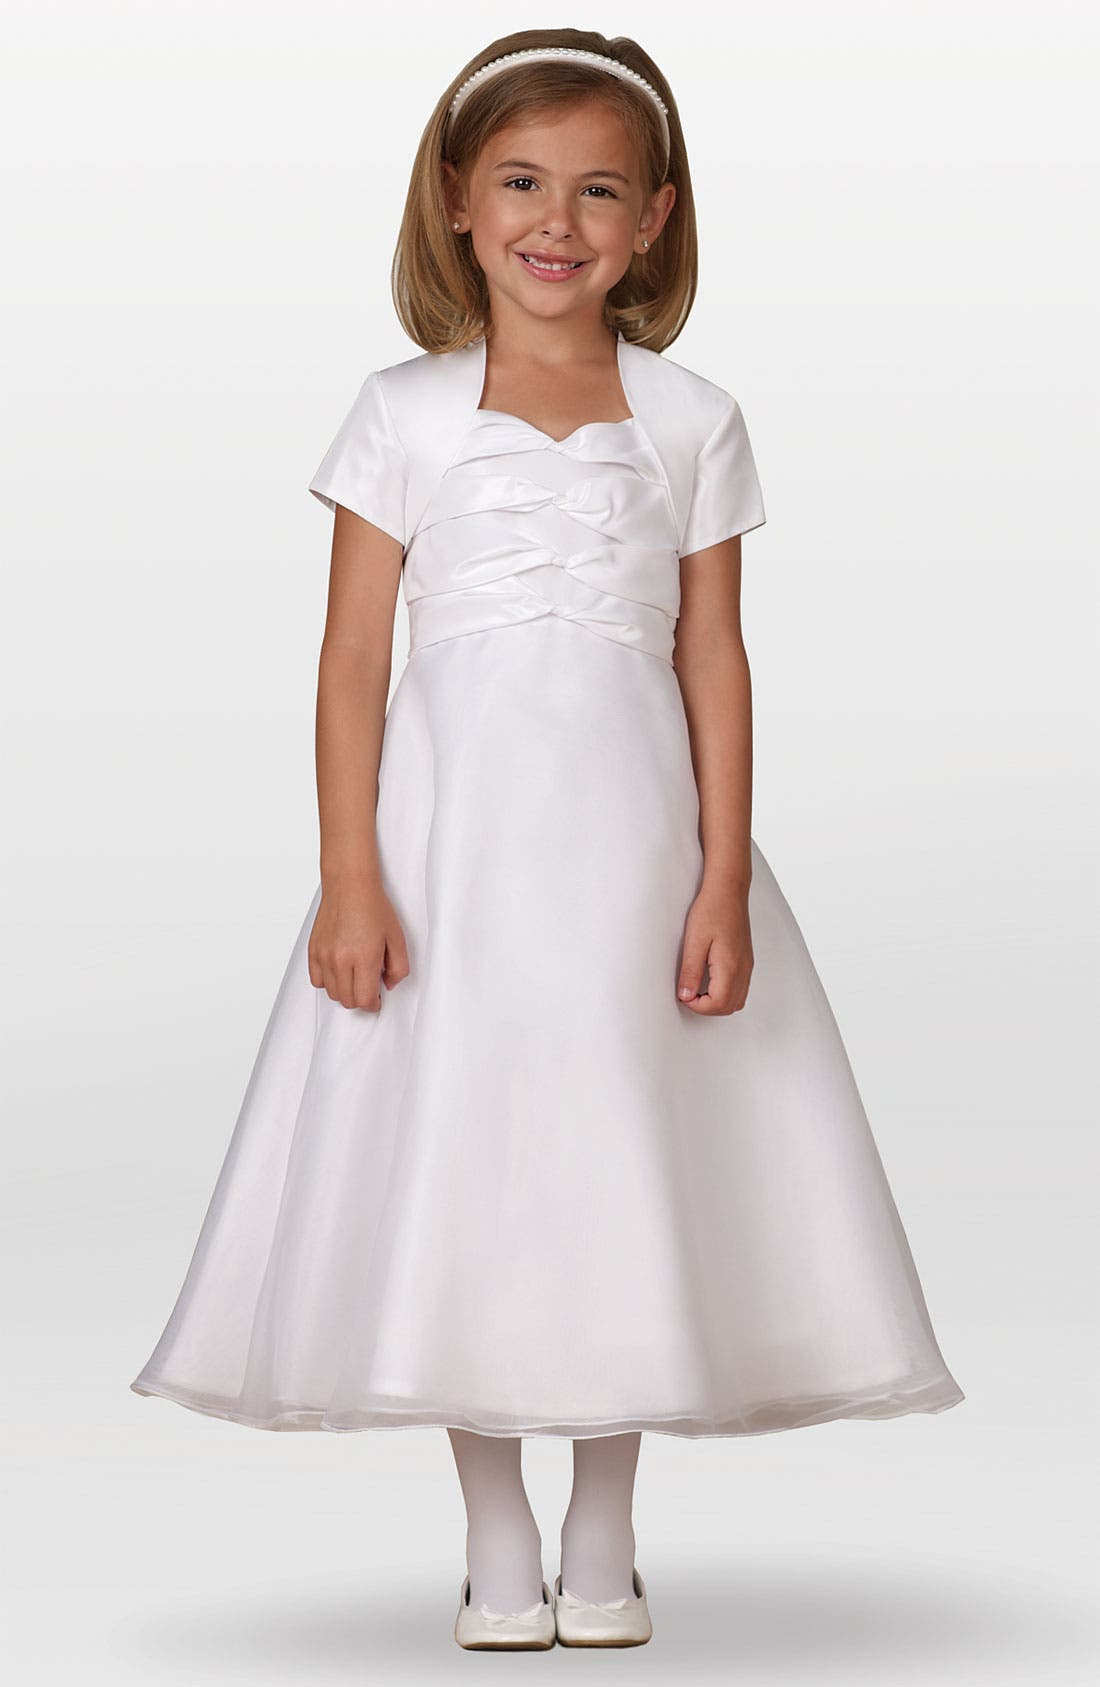 Main Image - Joan Calabrese for Mon Cheri Taffeta Dress & Bolero (Little Girls & Big Girls)